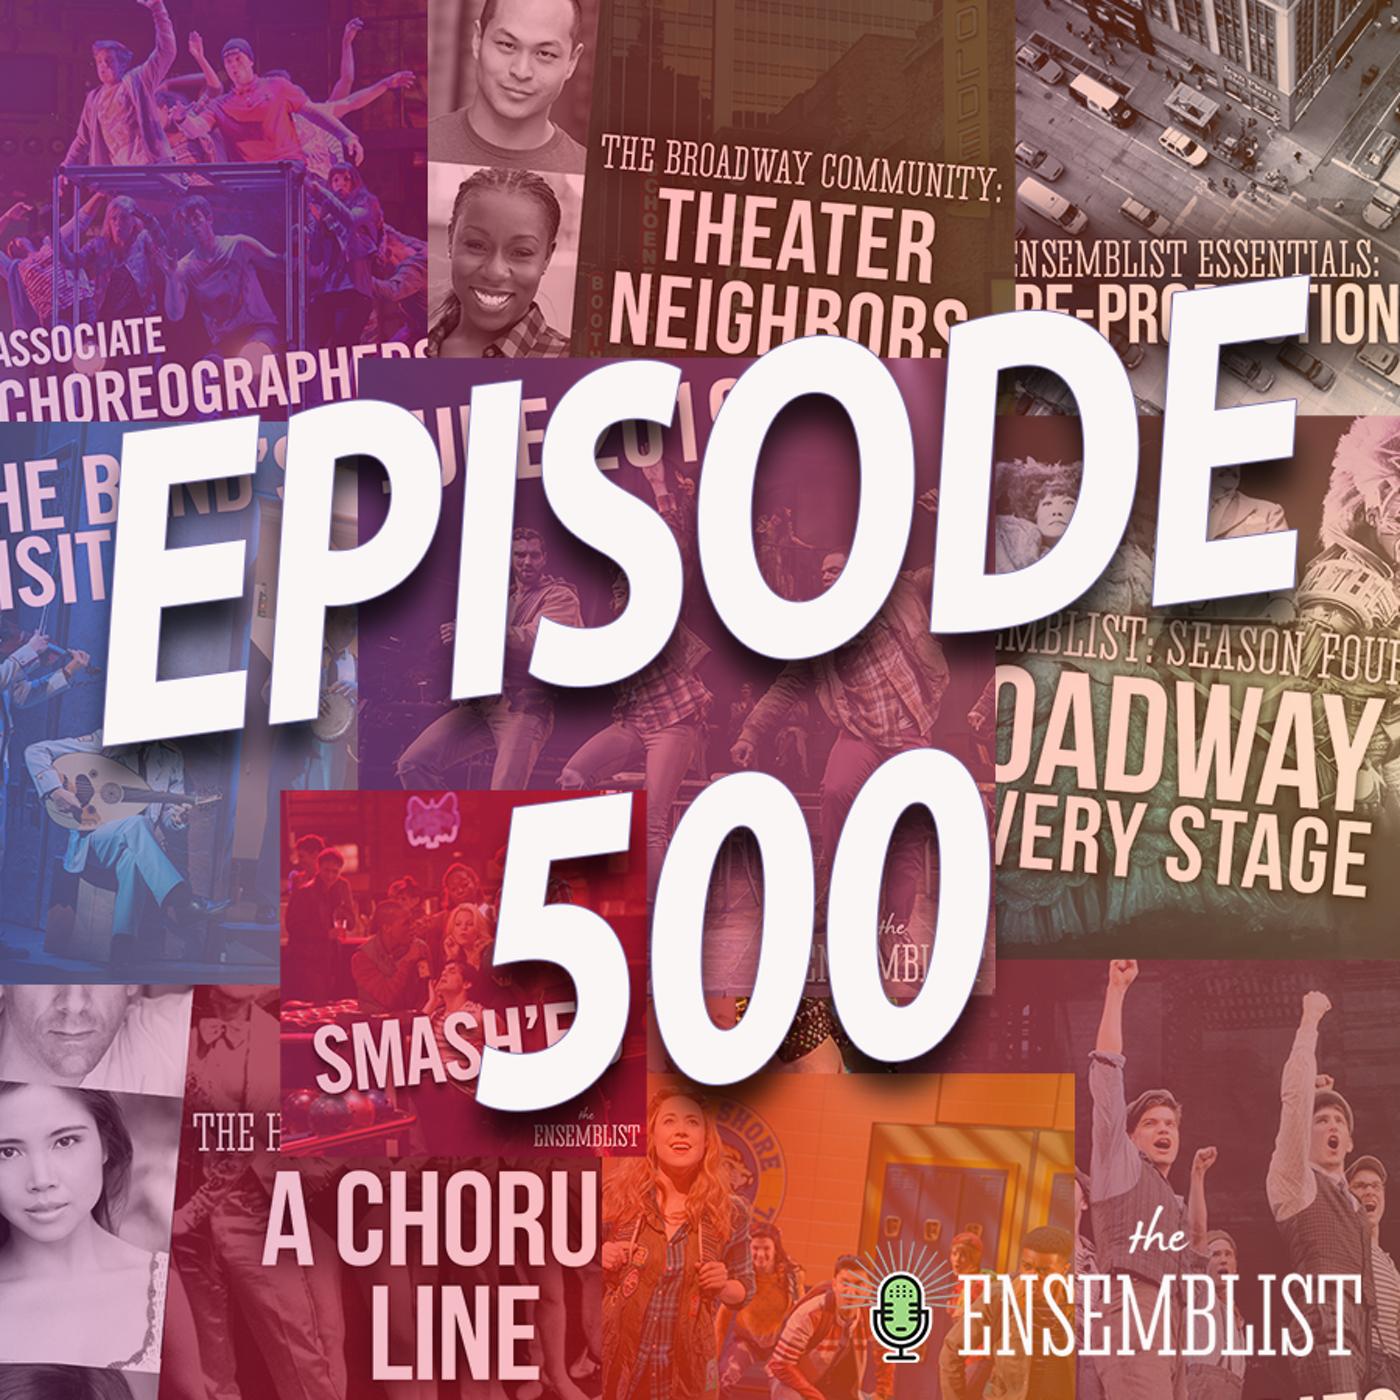 #500 - Episode 500 (feat. Nikka Graff Lanzarone, Anna Altheide, Hattie Andres, Chad Campbell, Jackson Cline, Angela Tricarico)